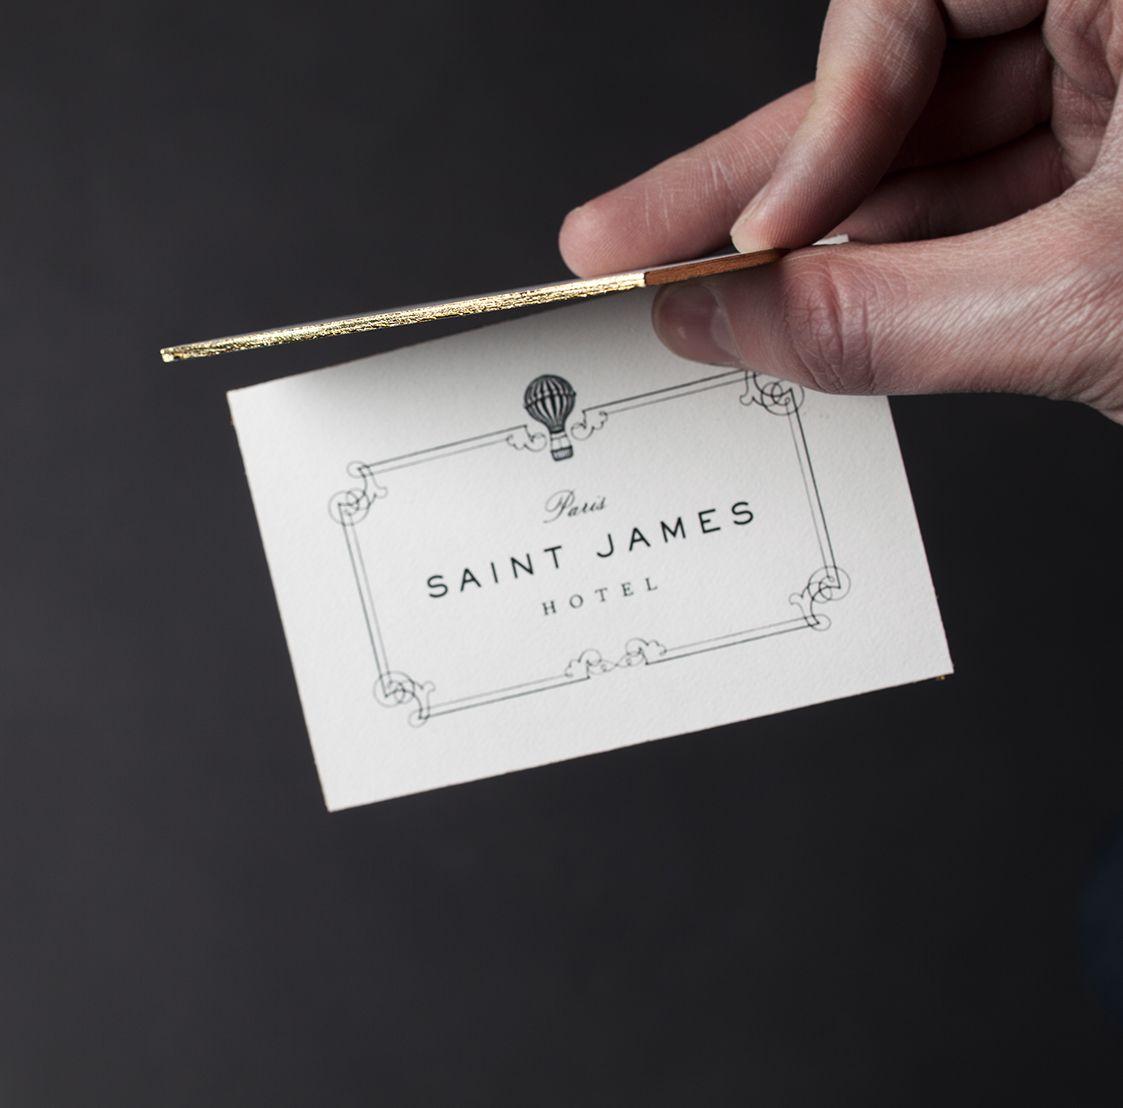 saint james paris hotel & club business card with gold leaf detail ...